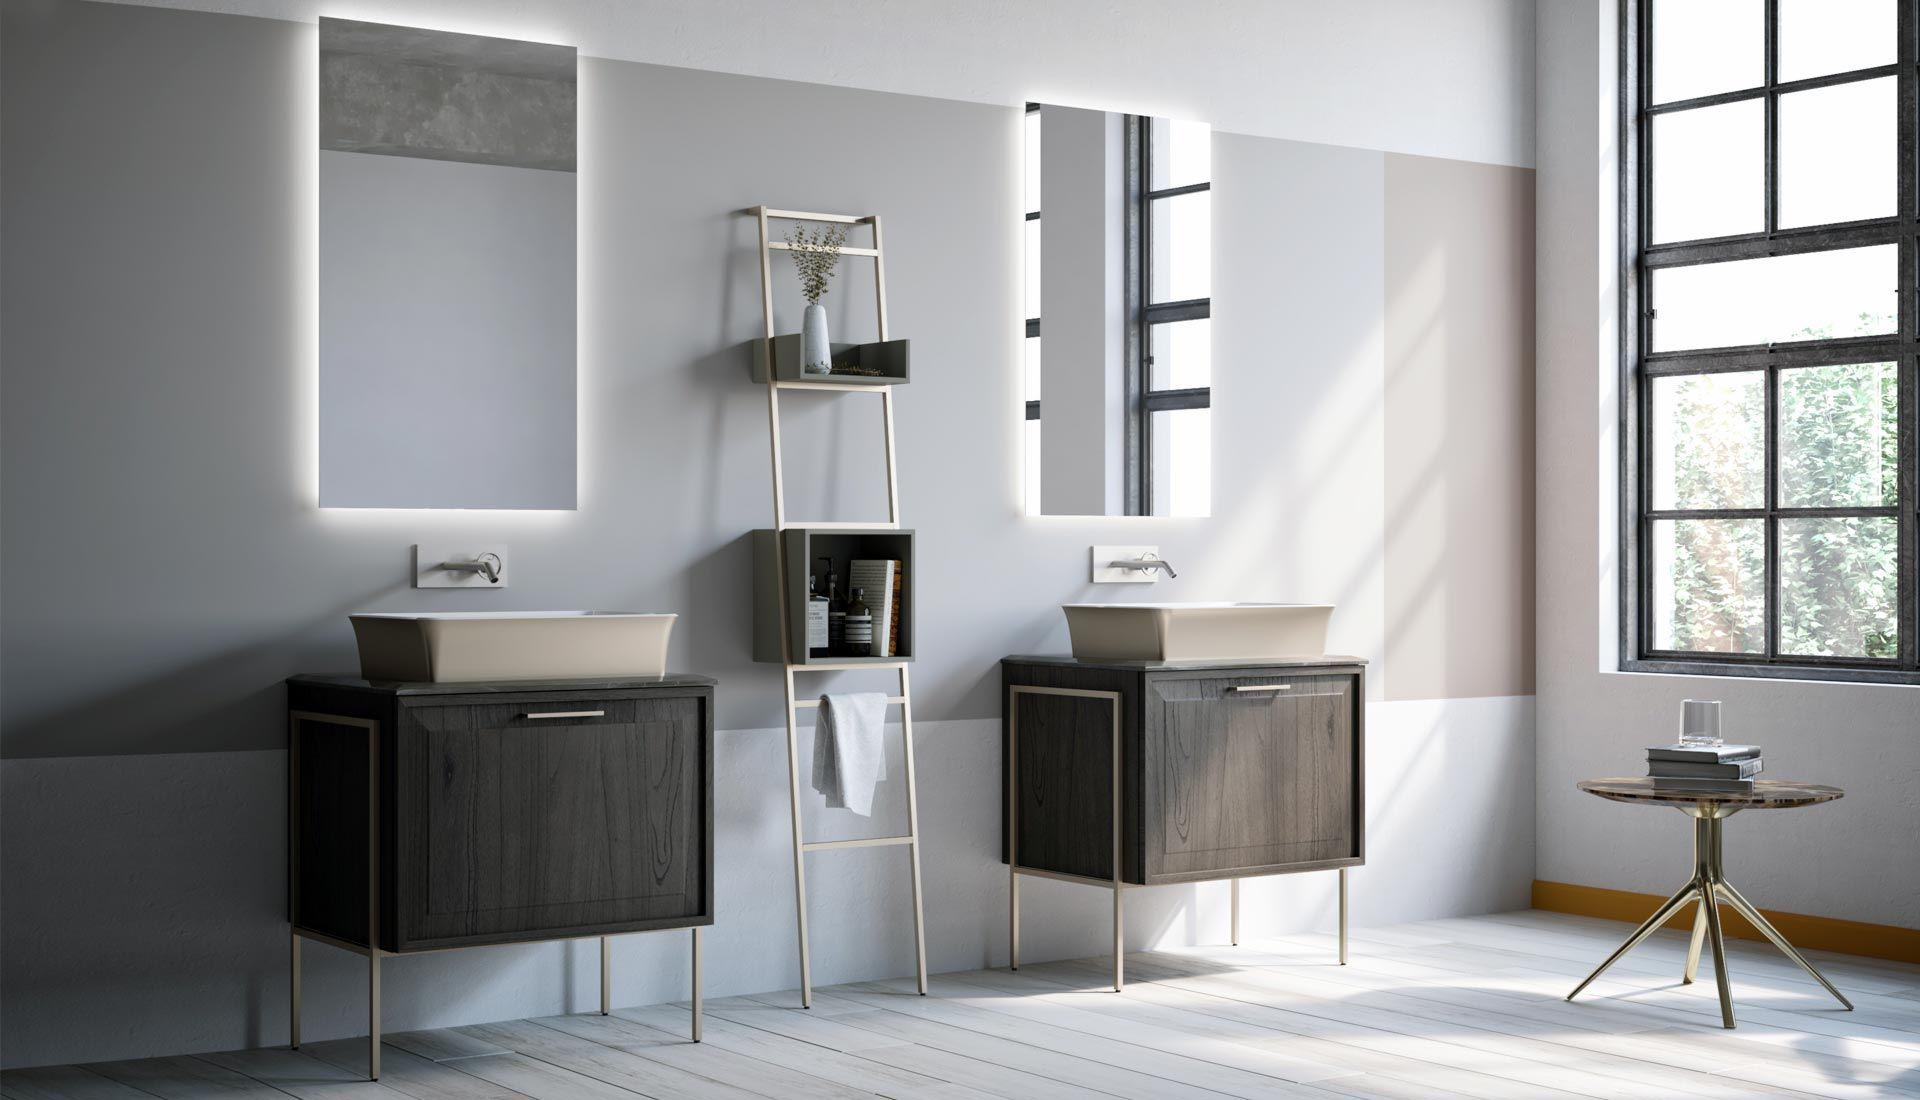 Arredobagno Puntotre Roma Arredobagno Bagno Arredamento Bathroom Designfurniture Styleinspiration Desig Design Del Bagno Arredamento Arredamento Bagno